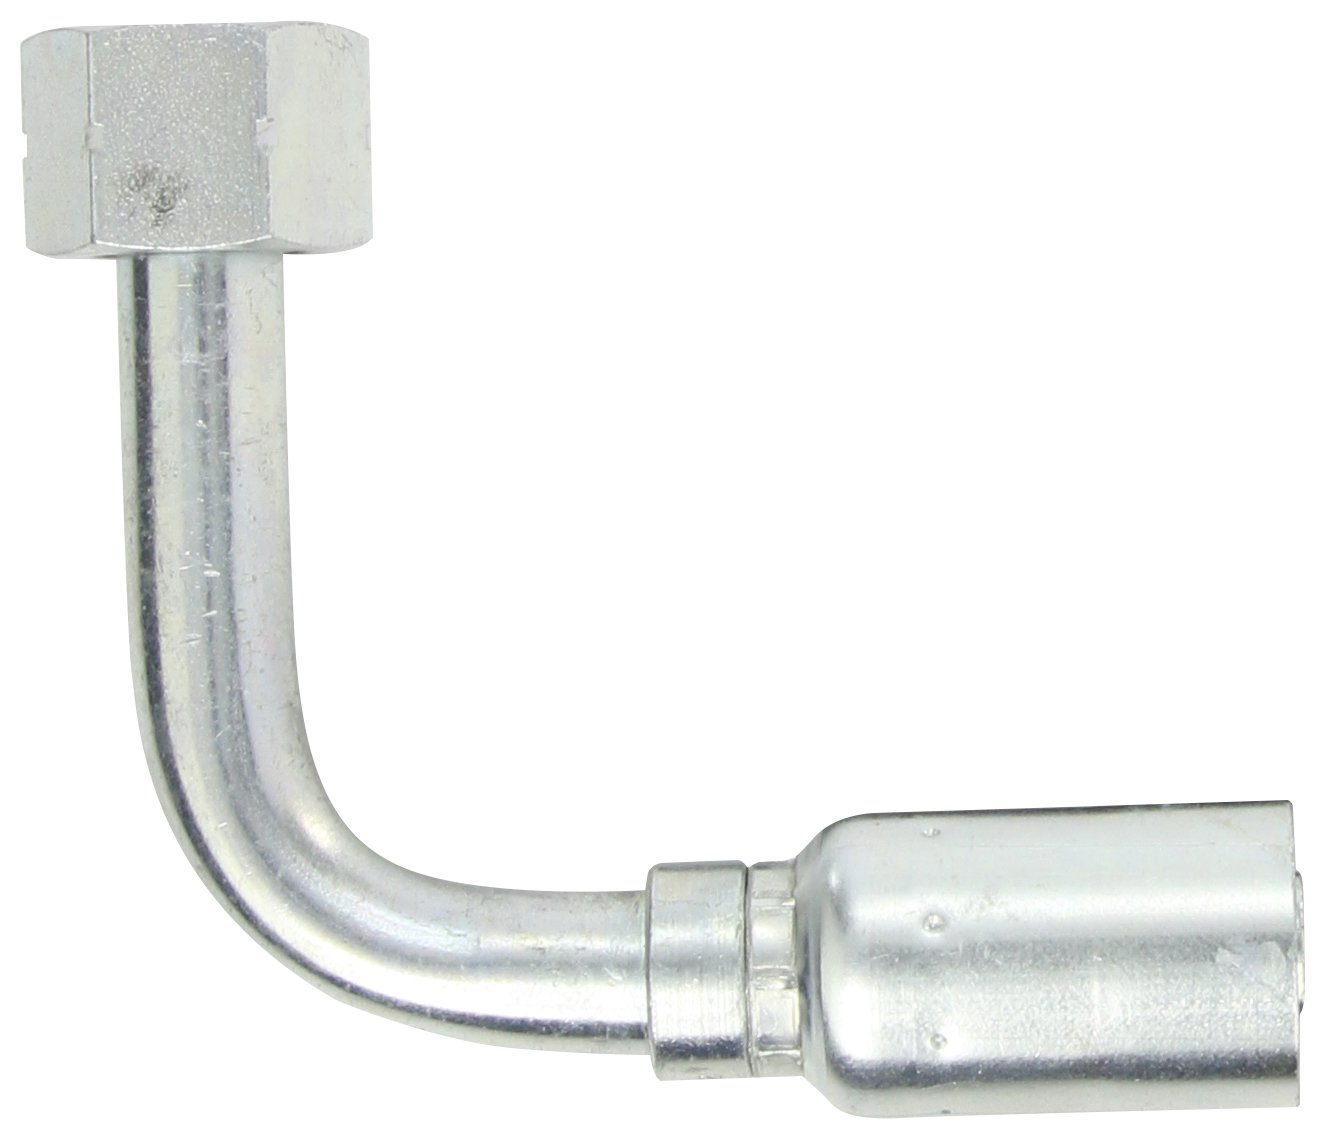 SAE 37 Degree Low Carbon Steel 3//4 Hose ID 3//4 Tube Size EATON Weatherhead Coll-O-Crimp 12U-652 90 Degree Female Swivel Long Drop Tube Elbow Fitting